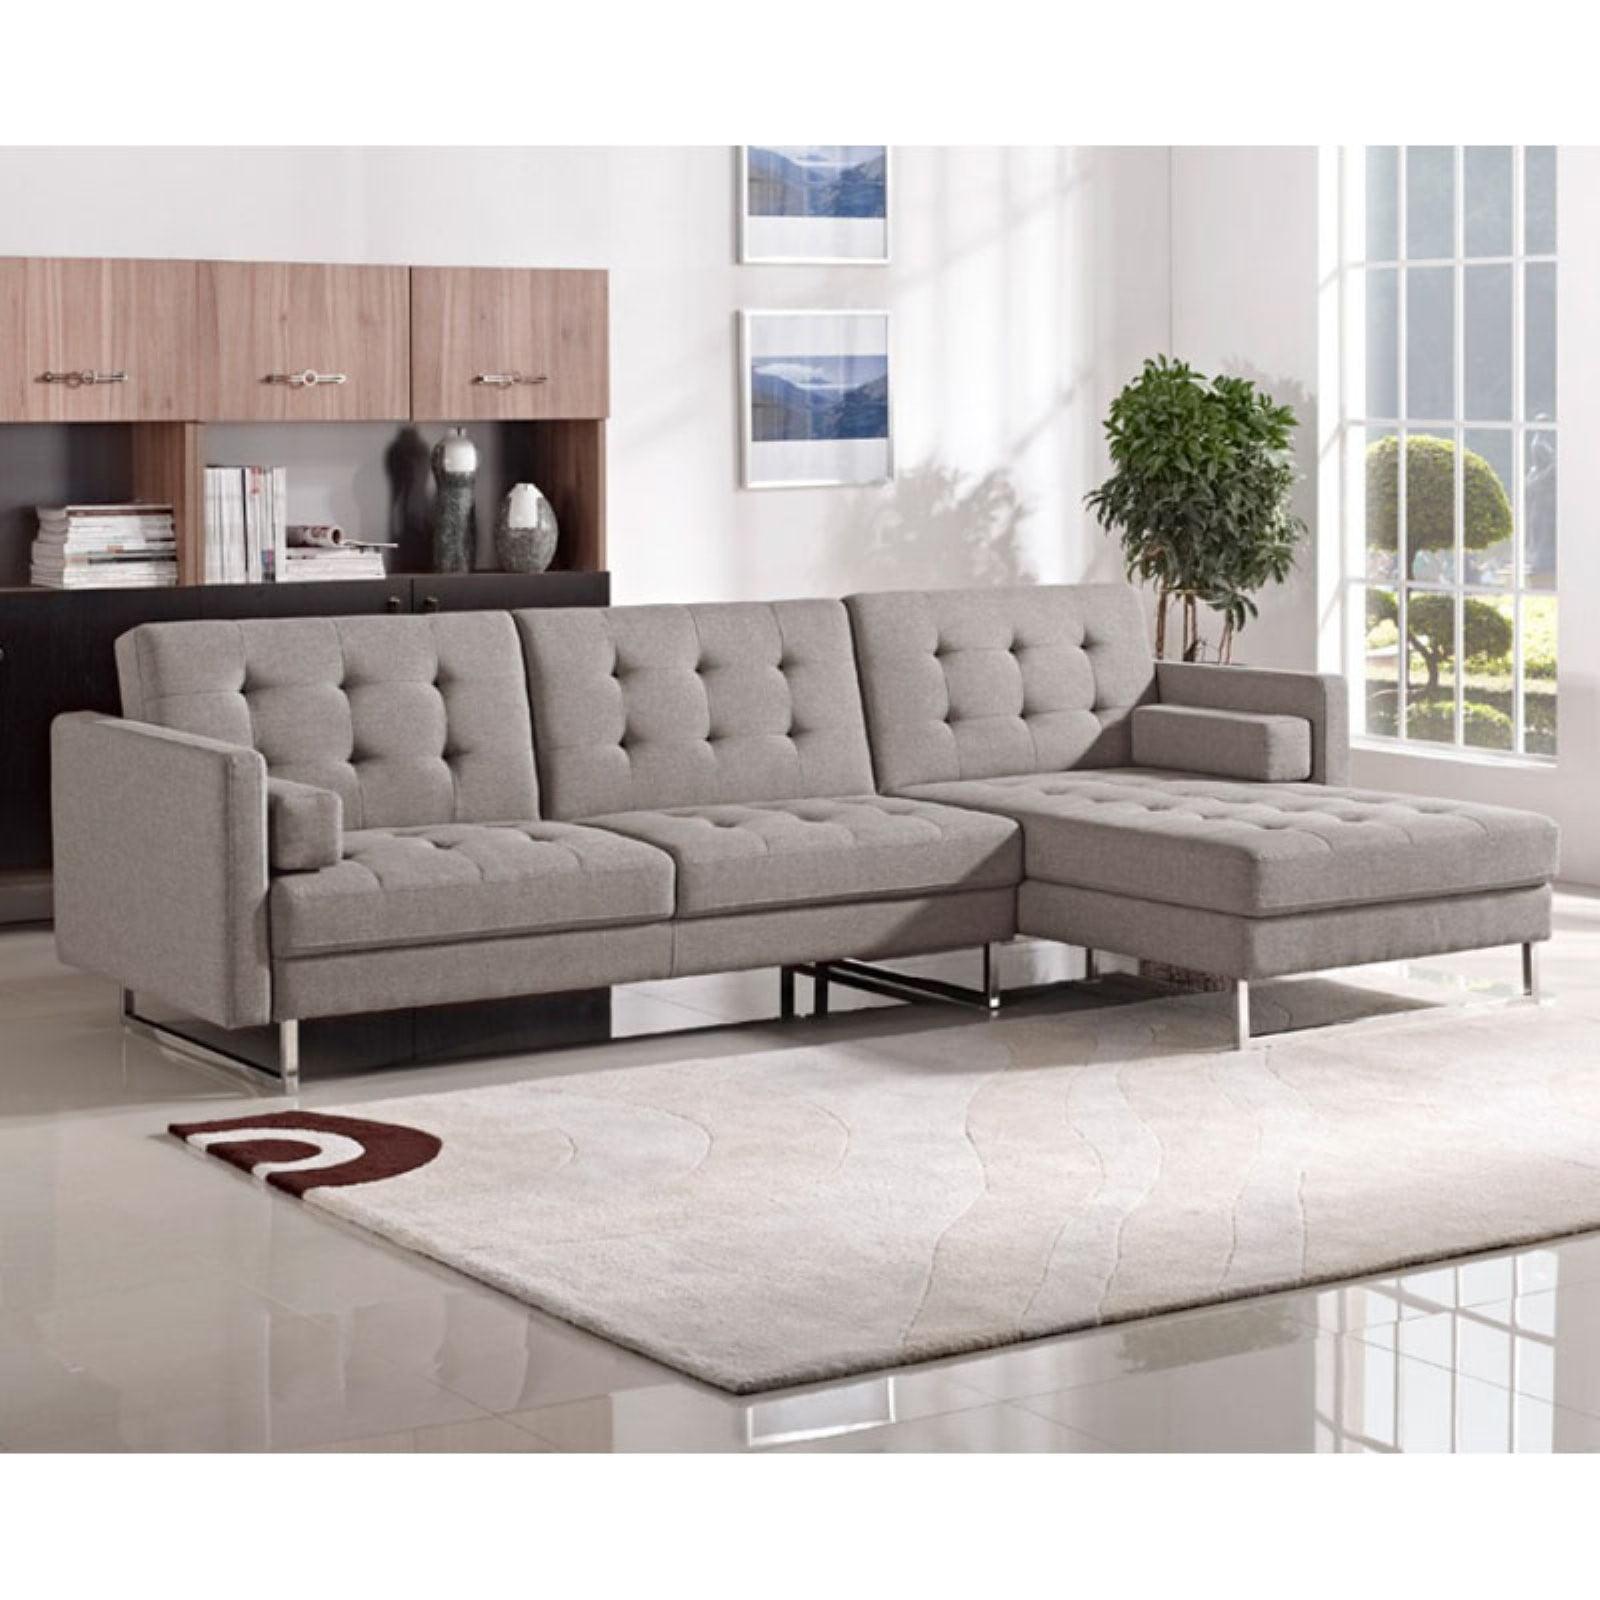 Divani Casa Smith Modern Fabric Sectional Sofa - Walmart.com